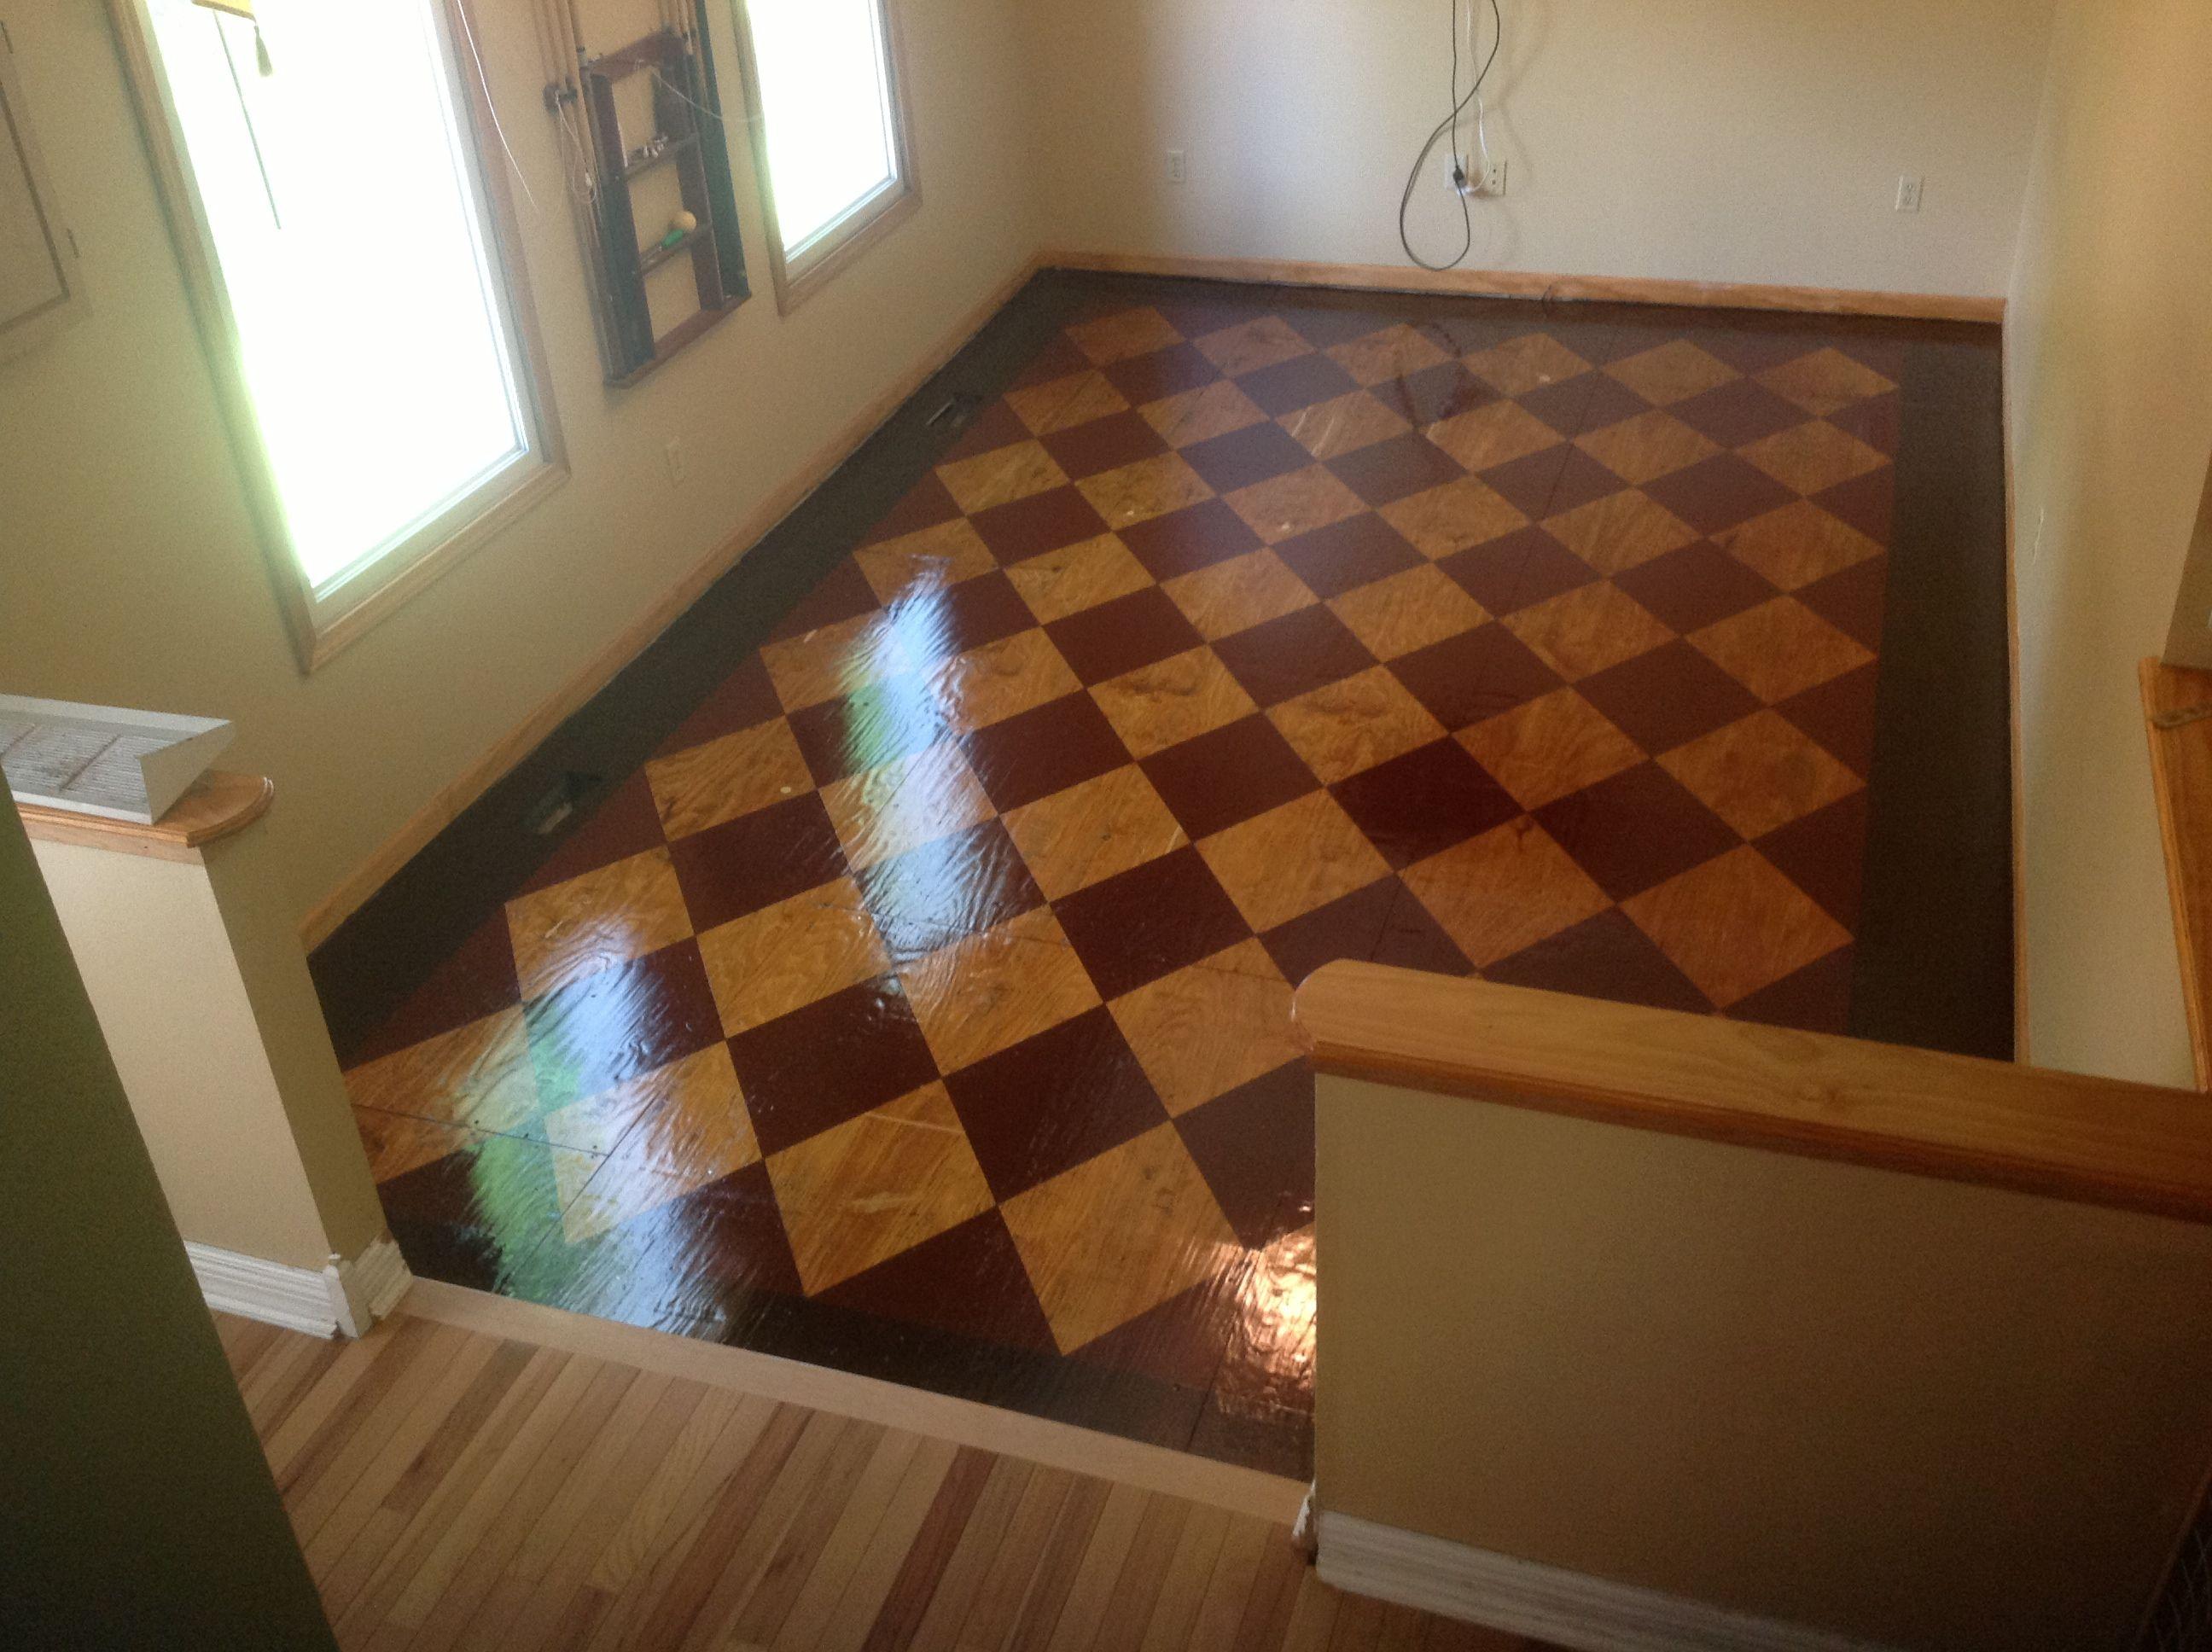 Stained Plywood Floor In 2019 Plywood Flooring Diy